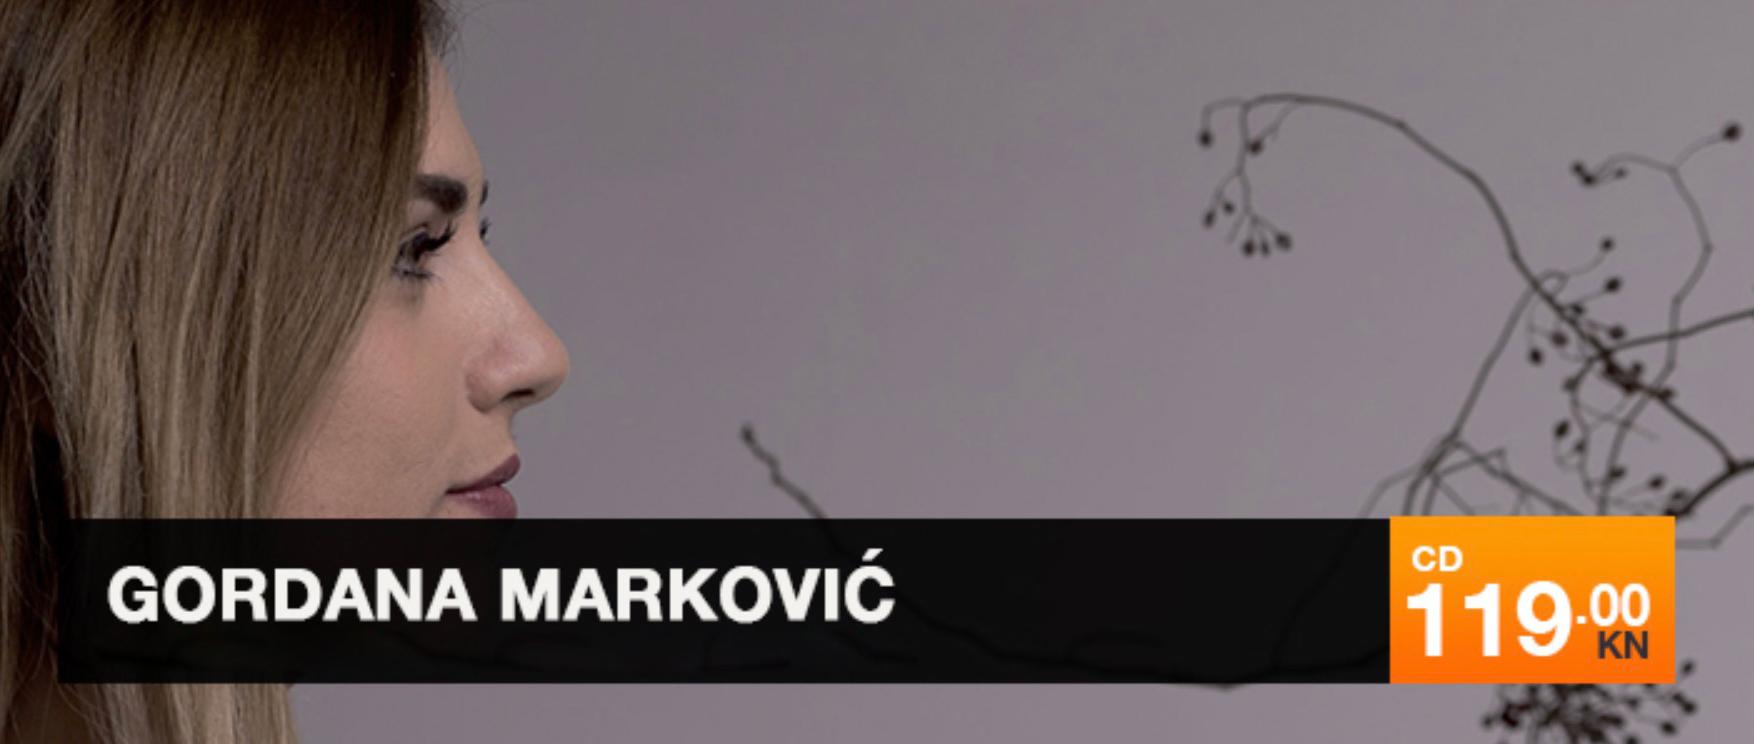 Gordana Markovic